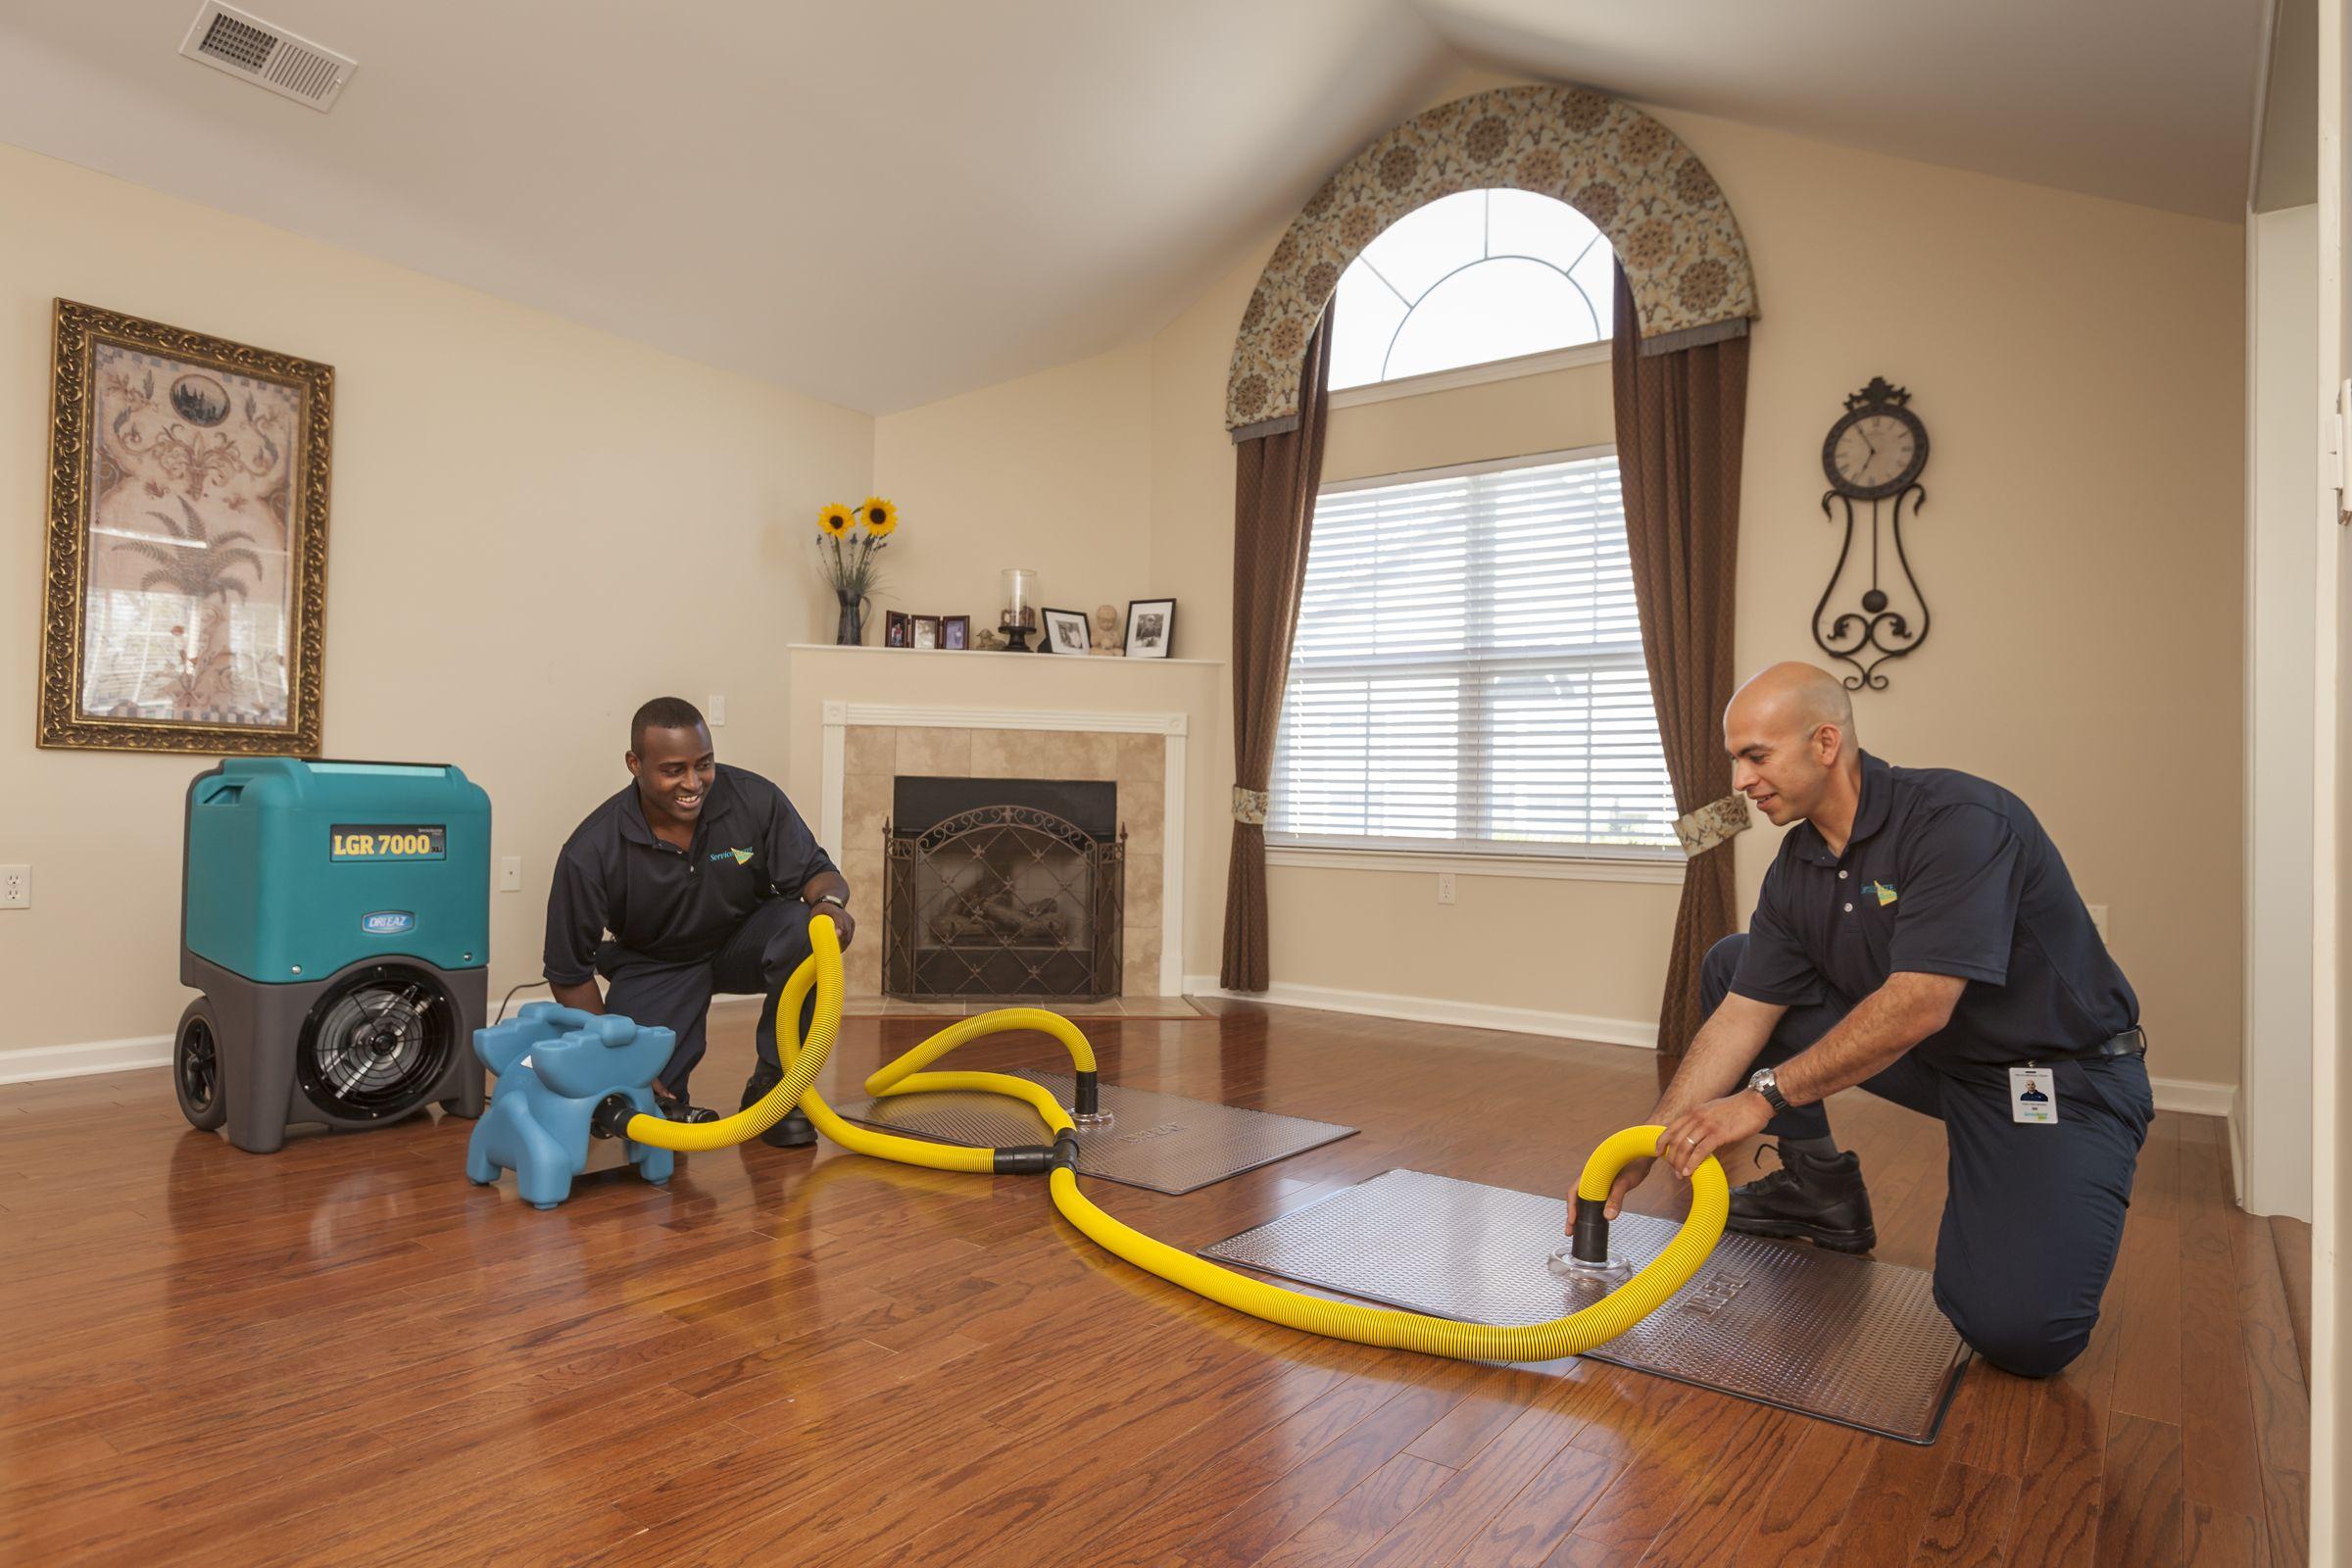 Fire Damage And Water Damage Restoration In Conyers Ga In 2020 Water Damage Repair Restoration Services Damage Restoration